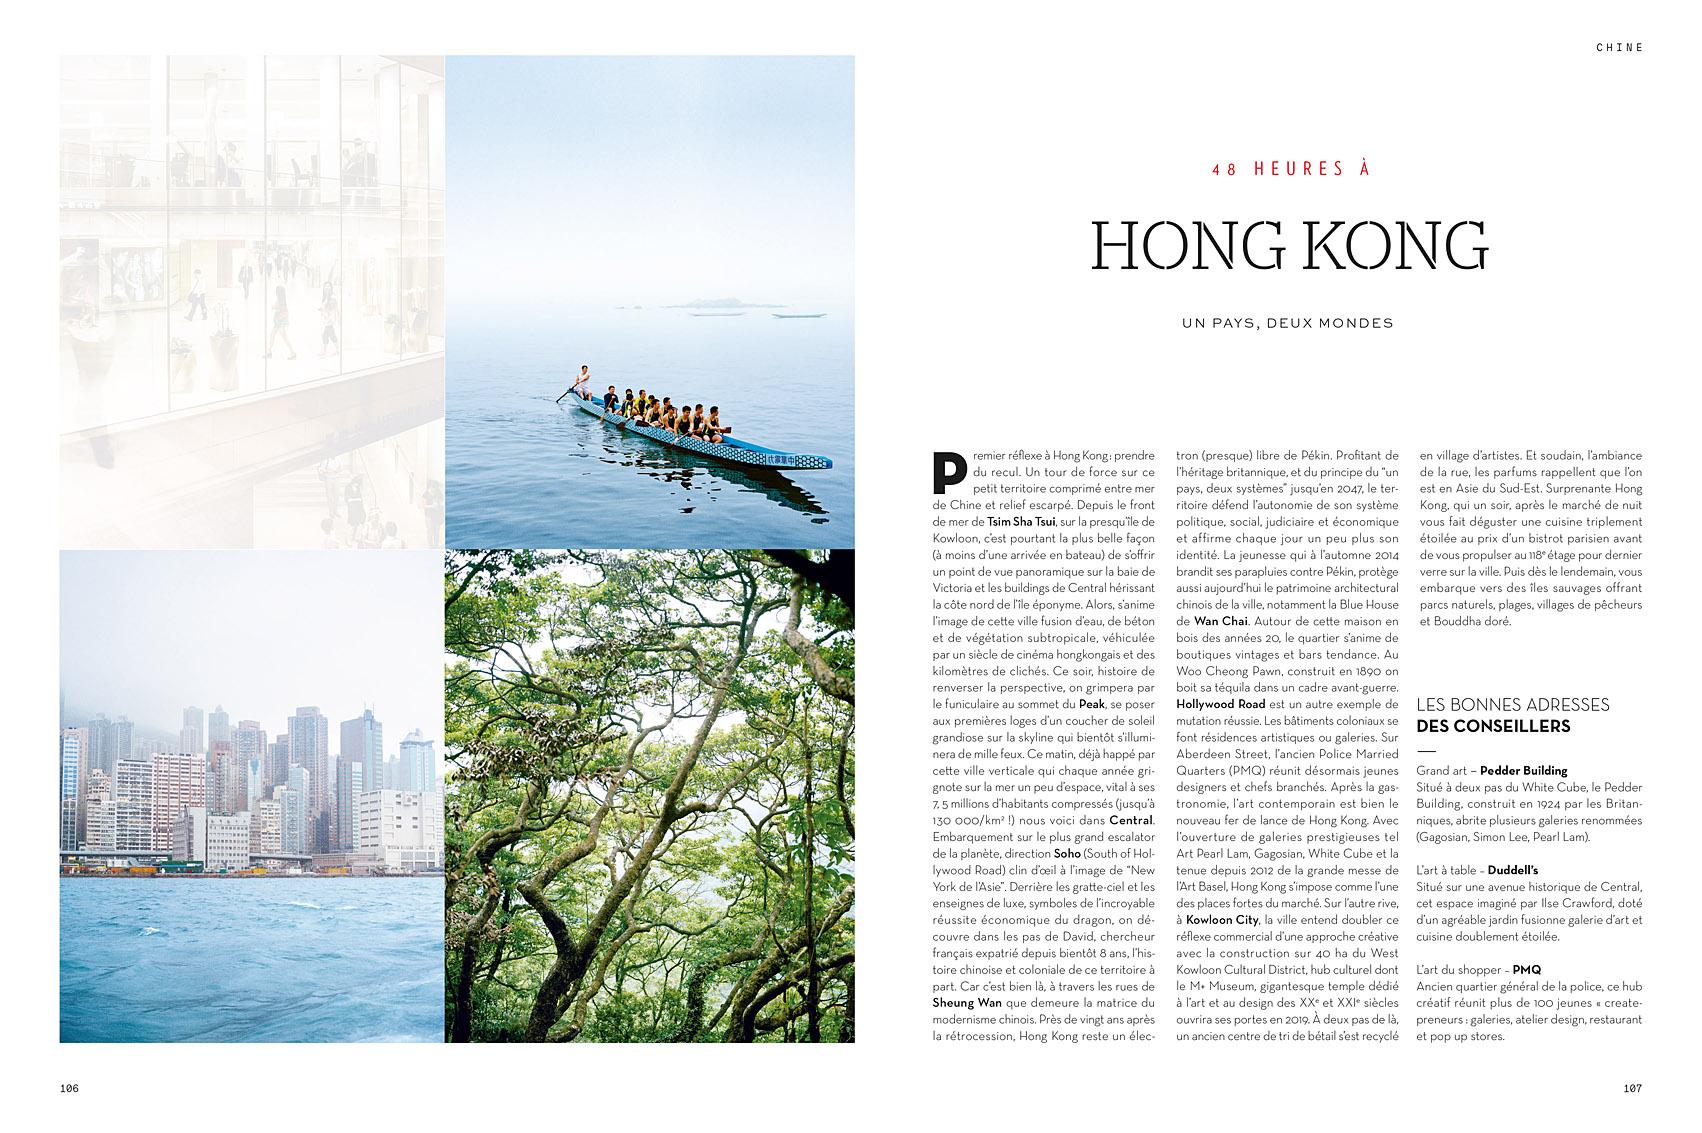 Voyageurs du Monde brochure Asie.